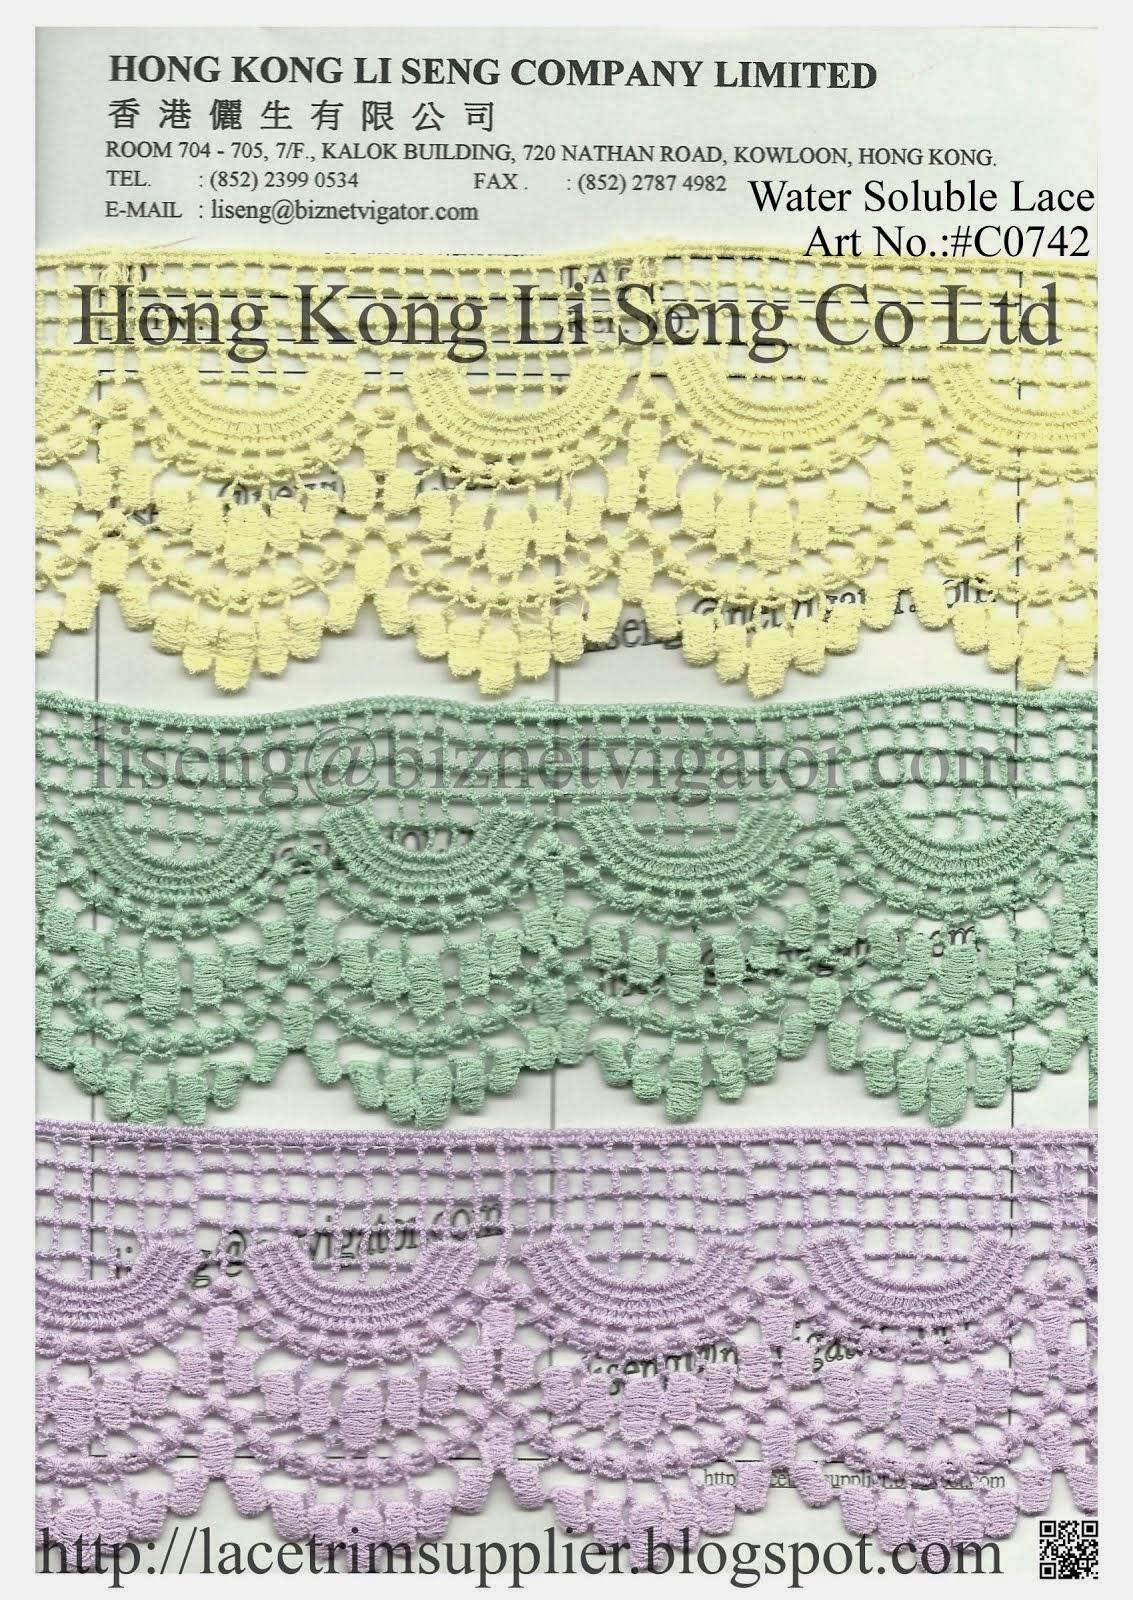 Dye to Match - Cotton Lace and Trims Manufacturer Wholesale Supplier - Hong Kong Li Seng Co Ltd